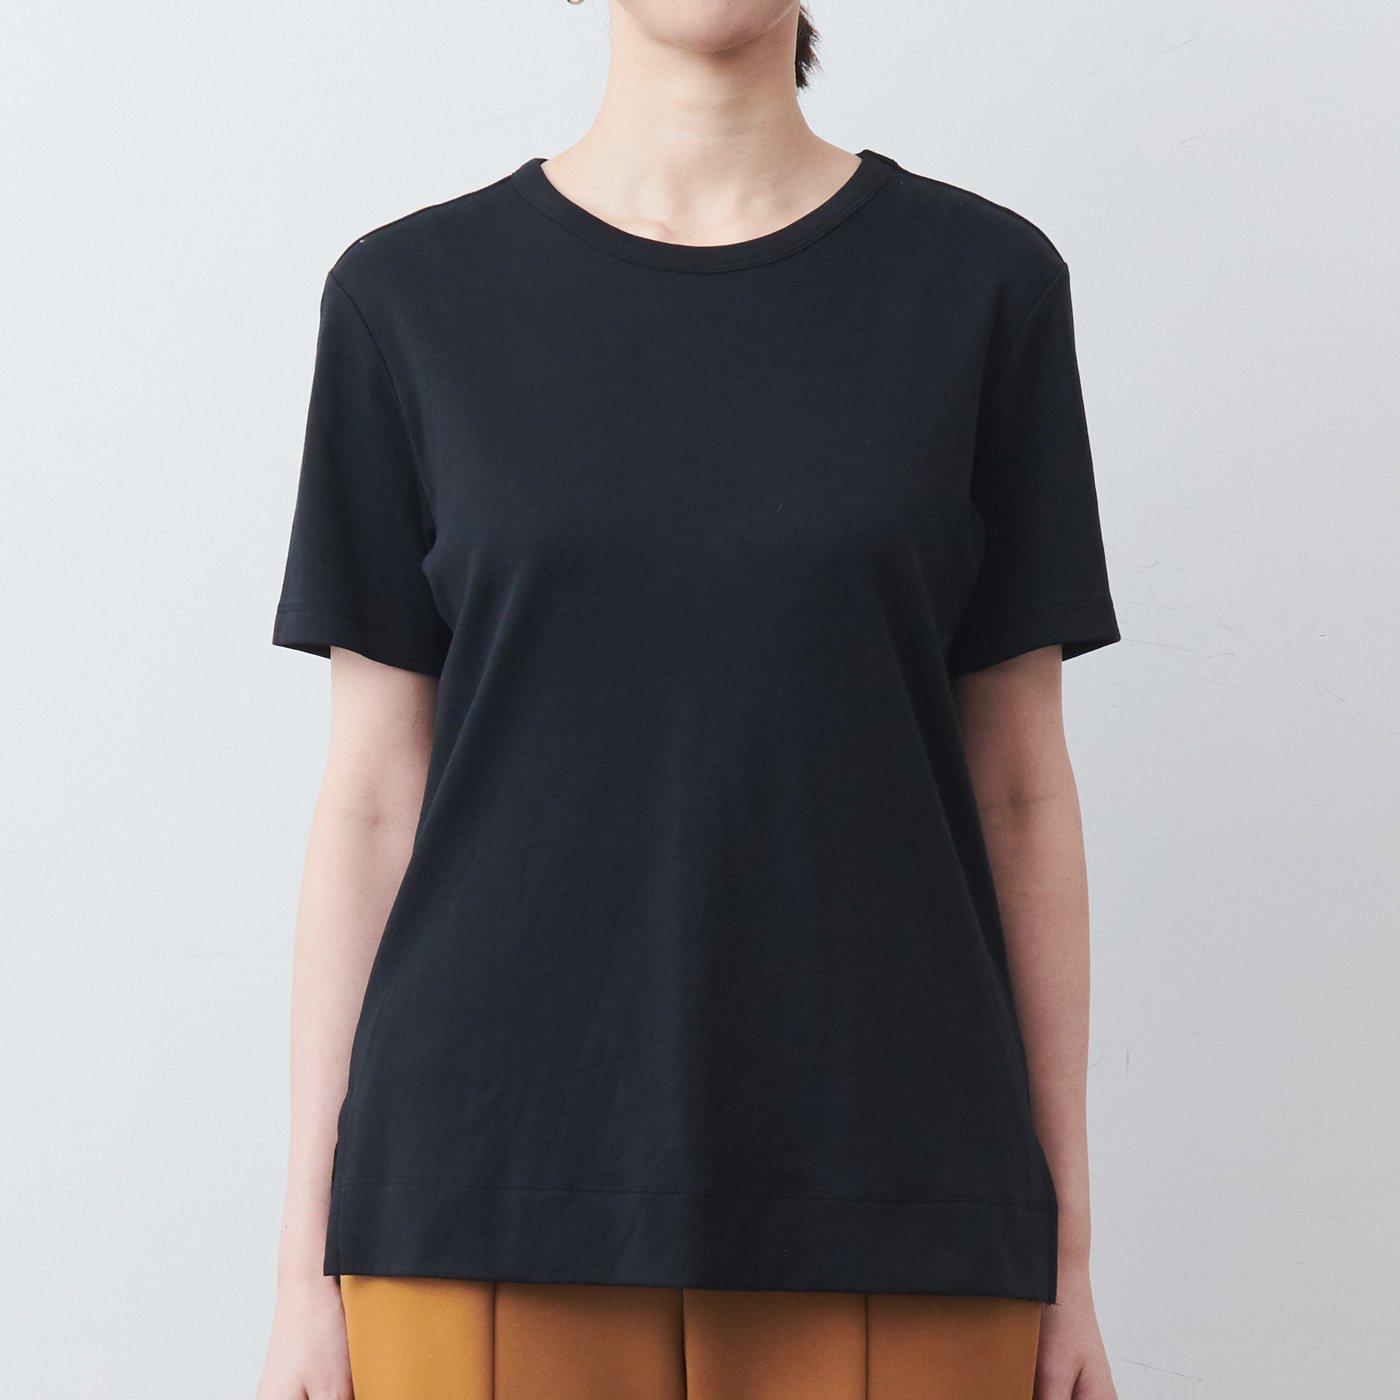 DRECOバイヤーズセレクト 大人の高機能スーピマコットンTシャツ〈ブラック〉